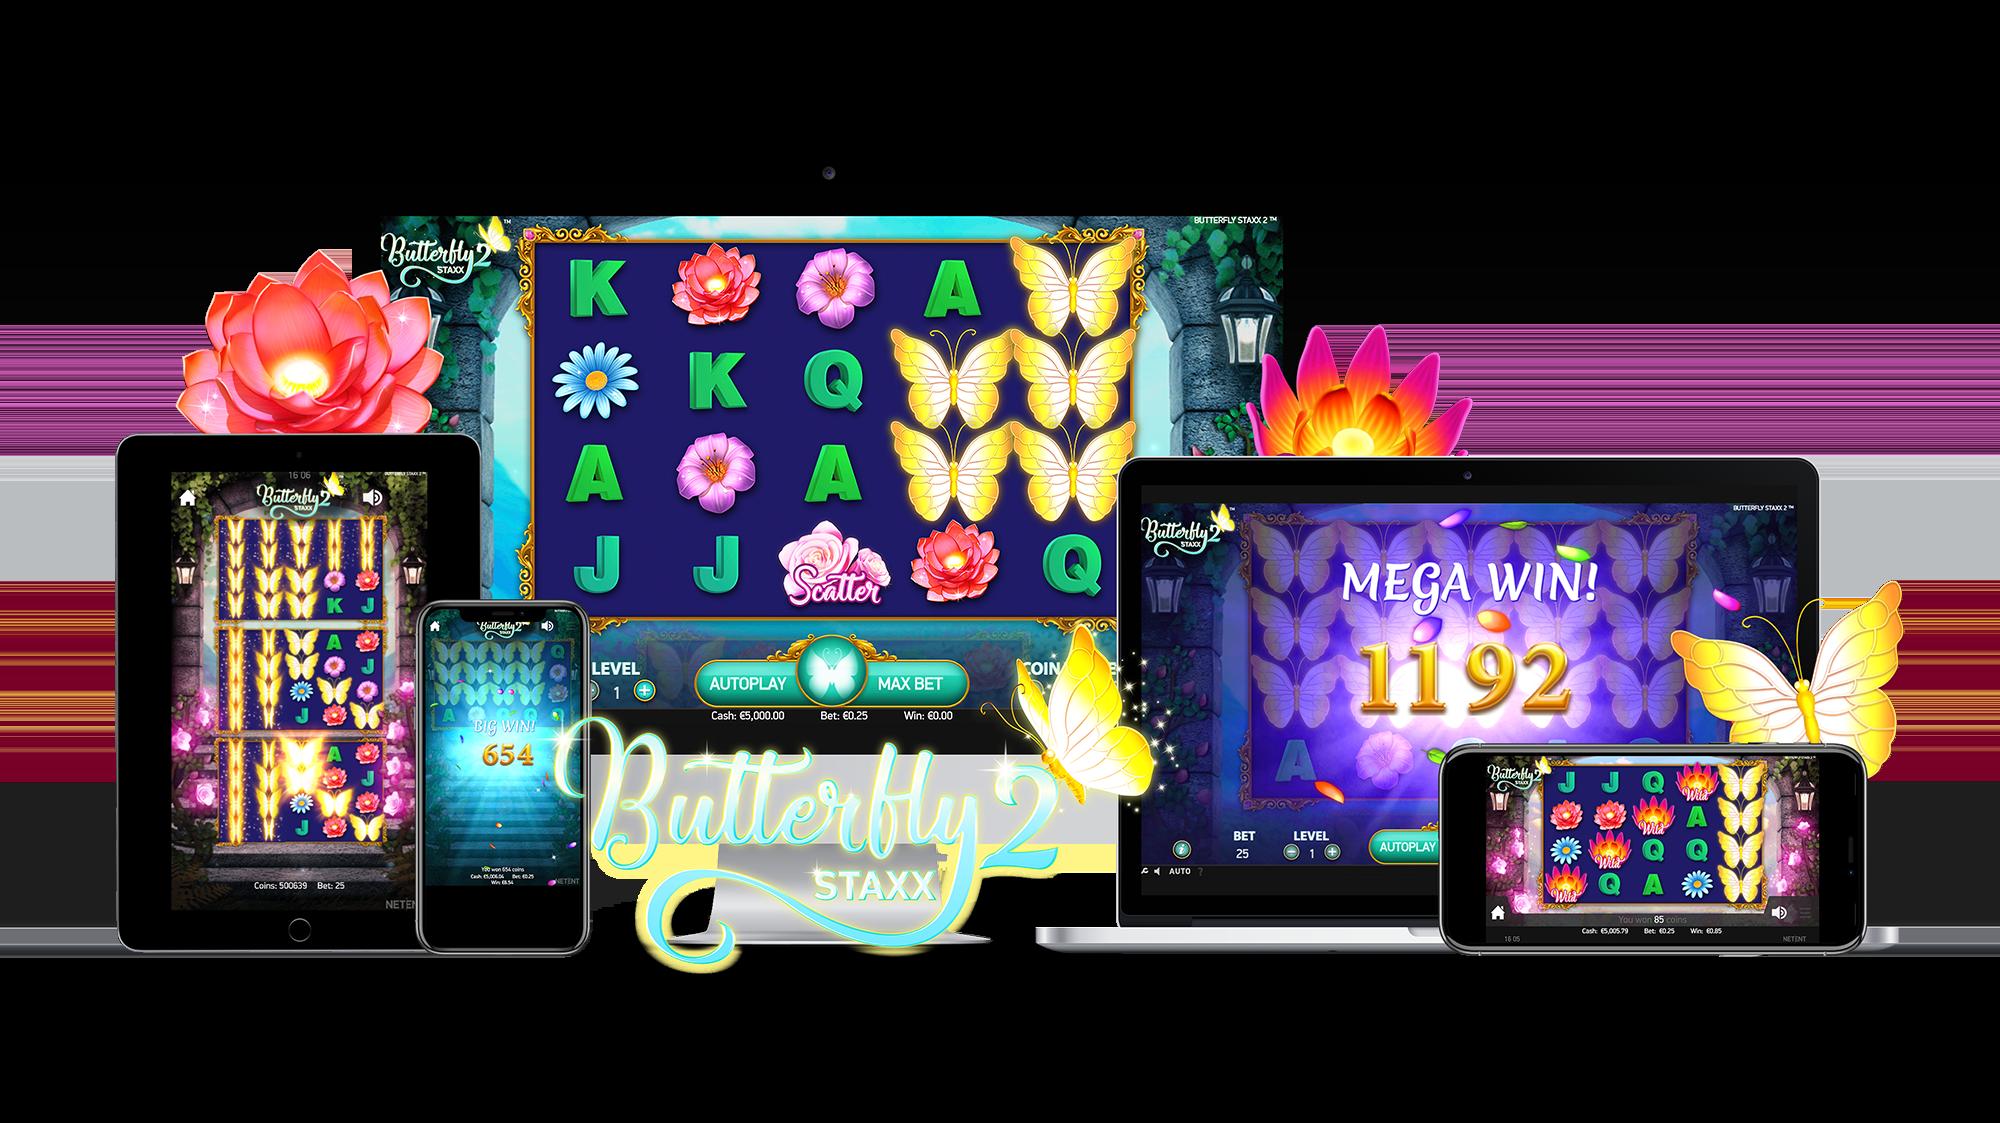 Butterfly Staxx 2 Gameplay Casino